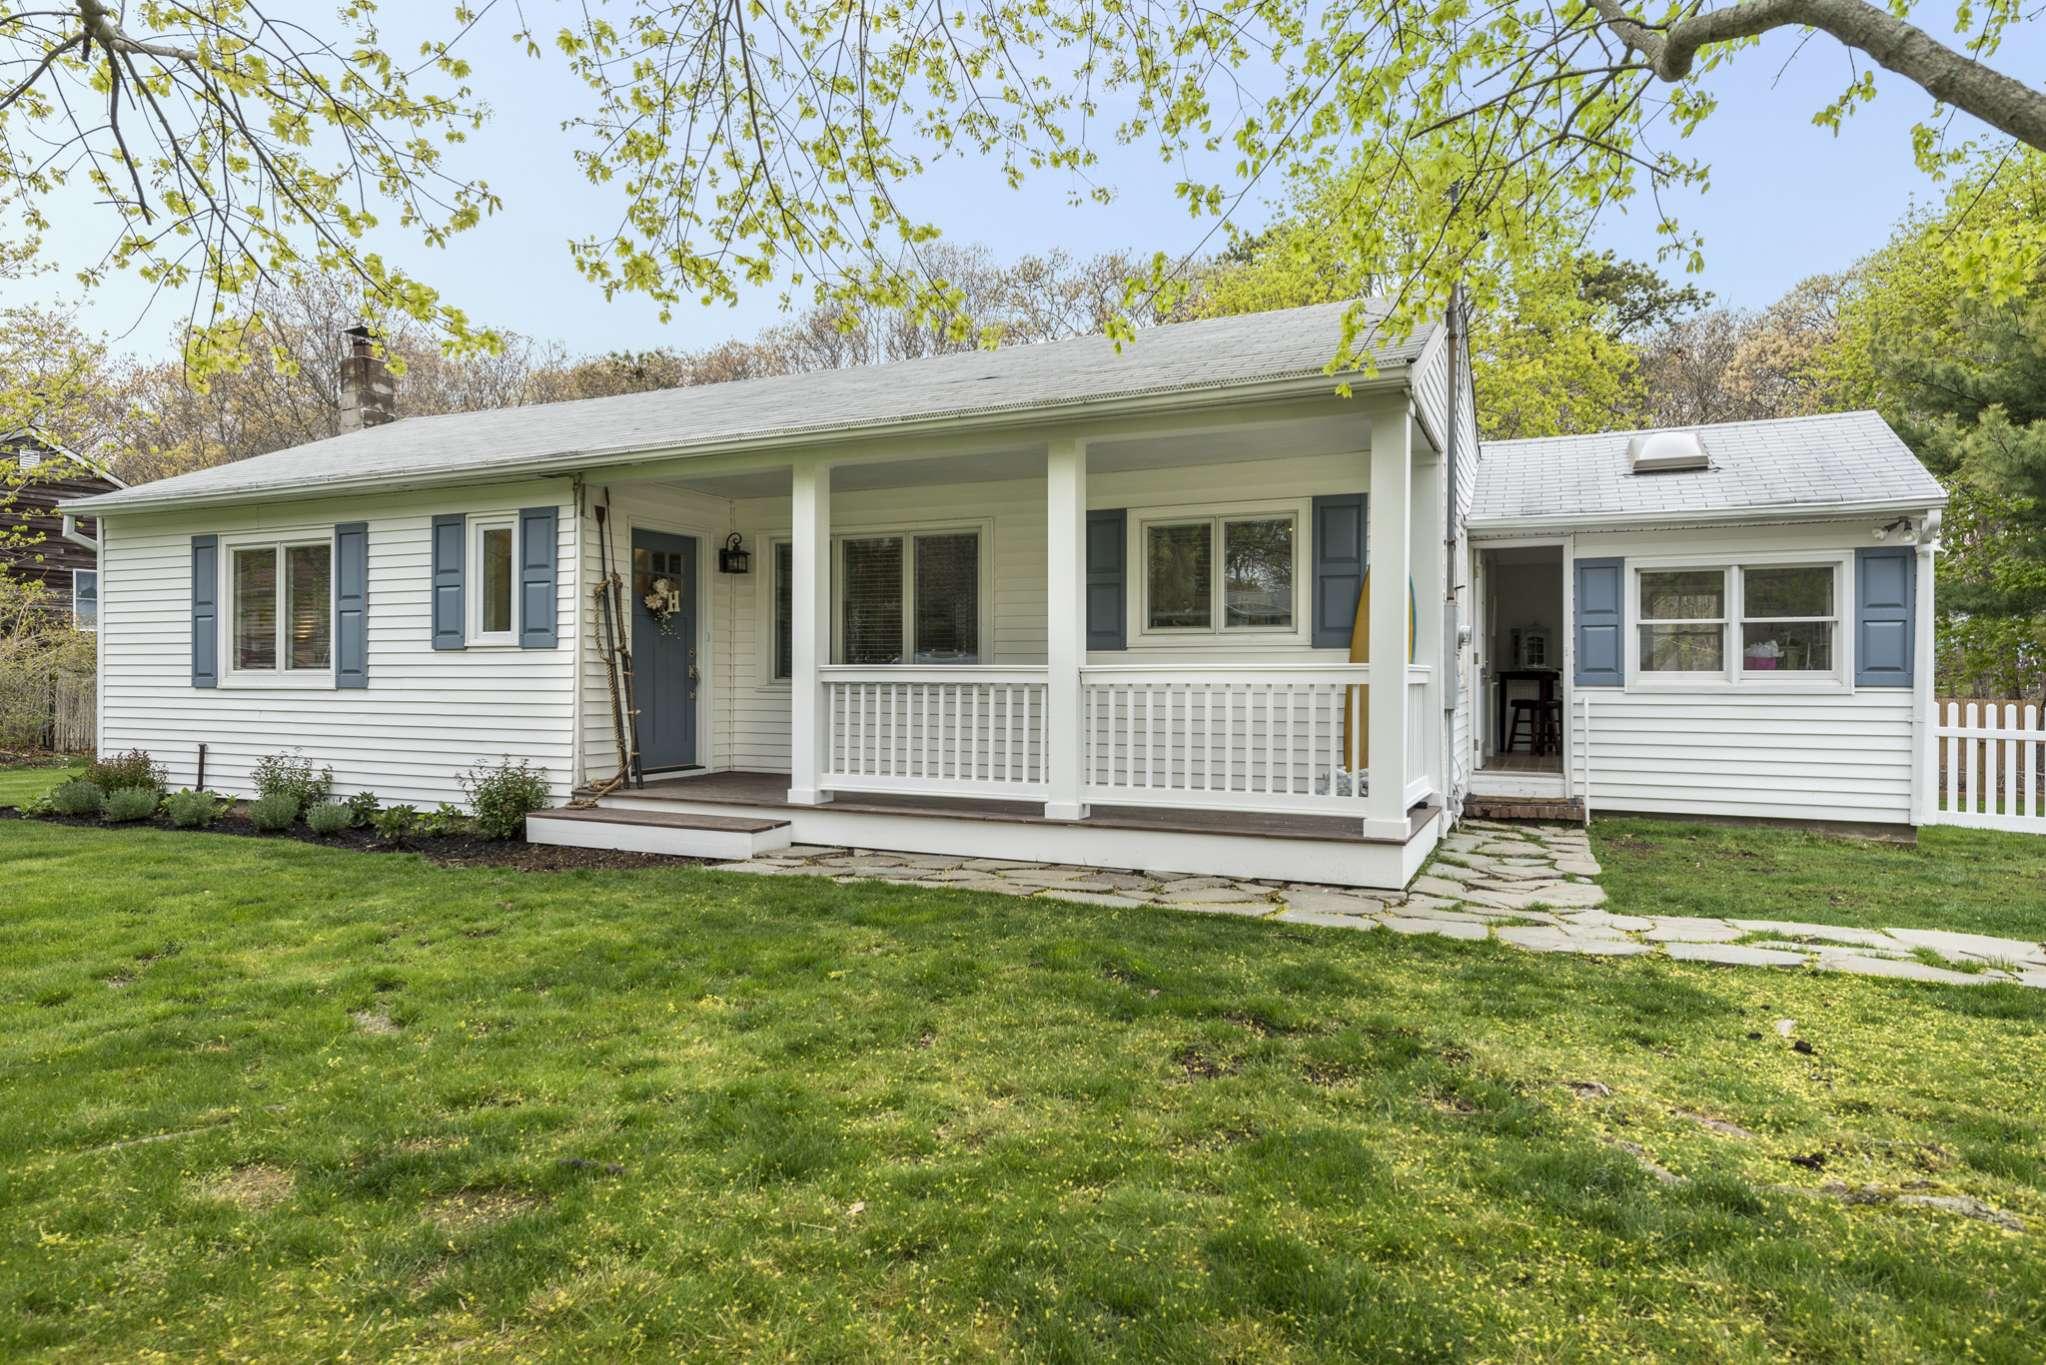 Single Family Home for Sale at Charming Beach Cottage 37 Woodridge Road, Hampton Bays, New York